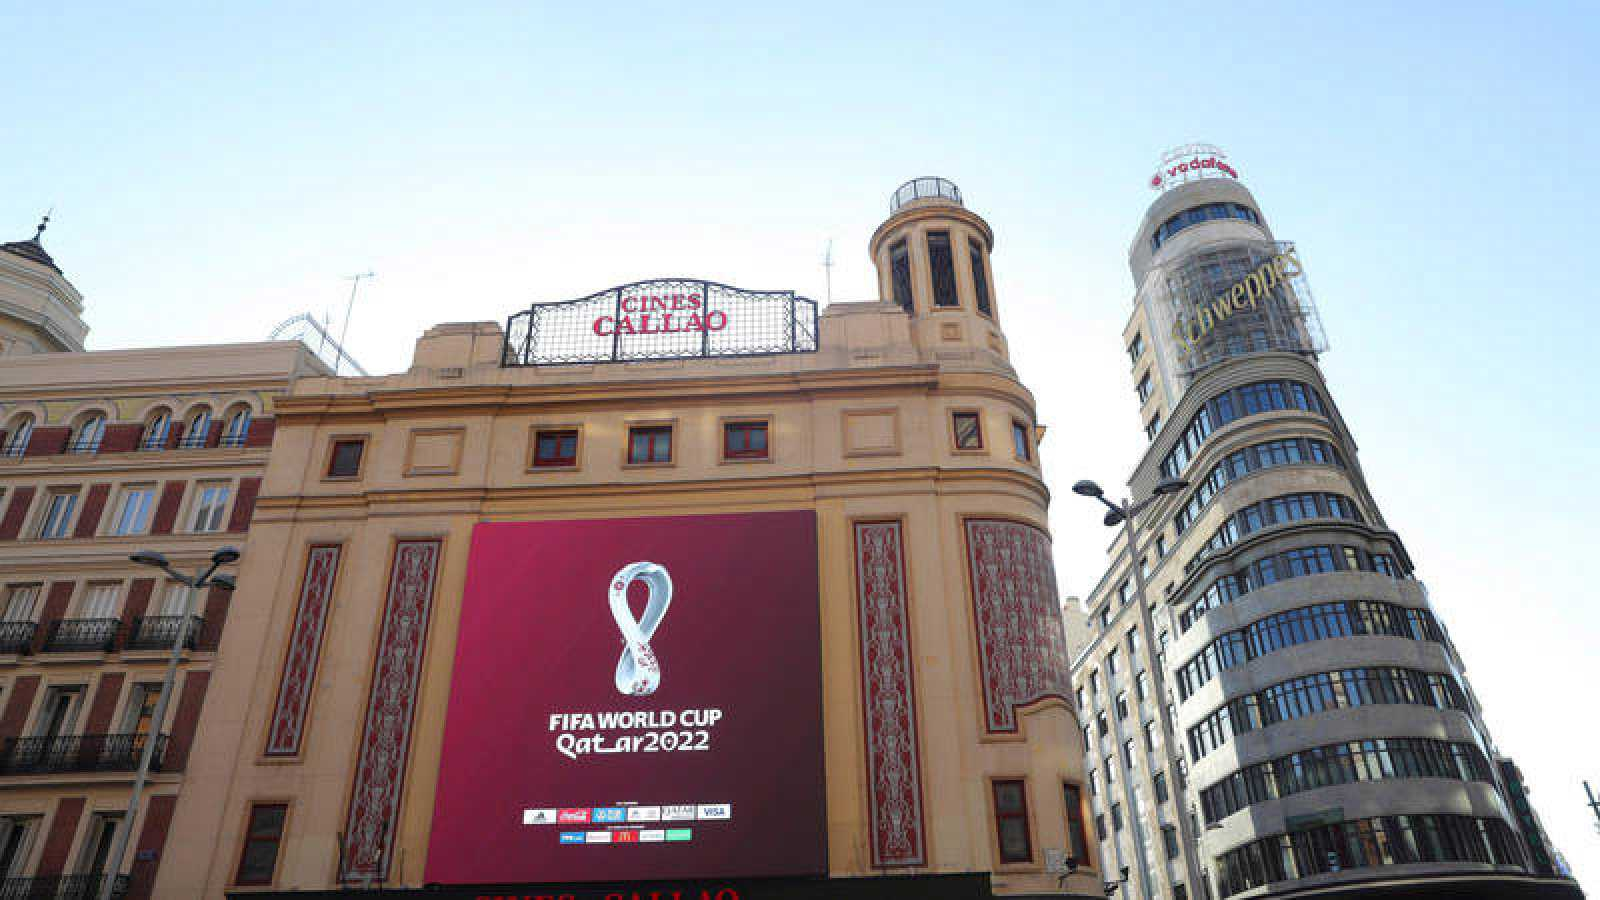 El Mundial de Catar 2022 desvela a nivel mundial su emblema oficial